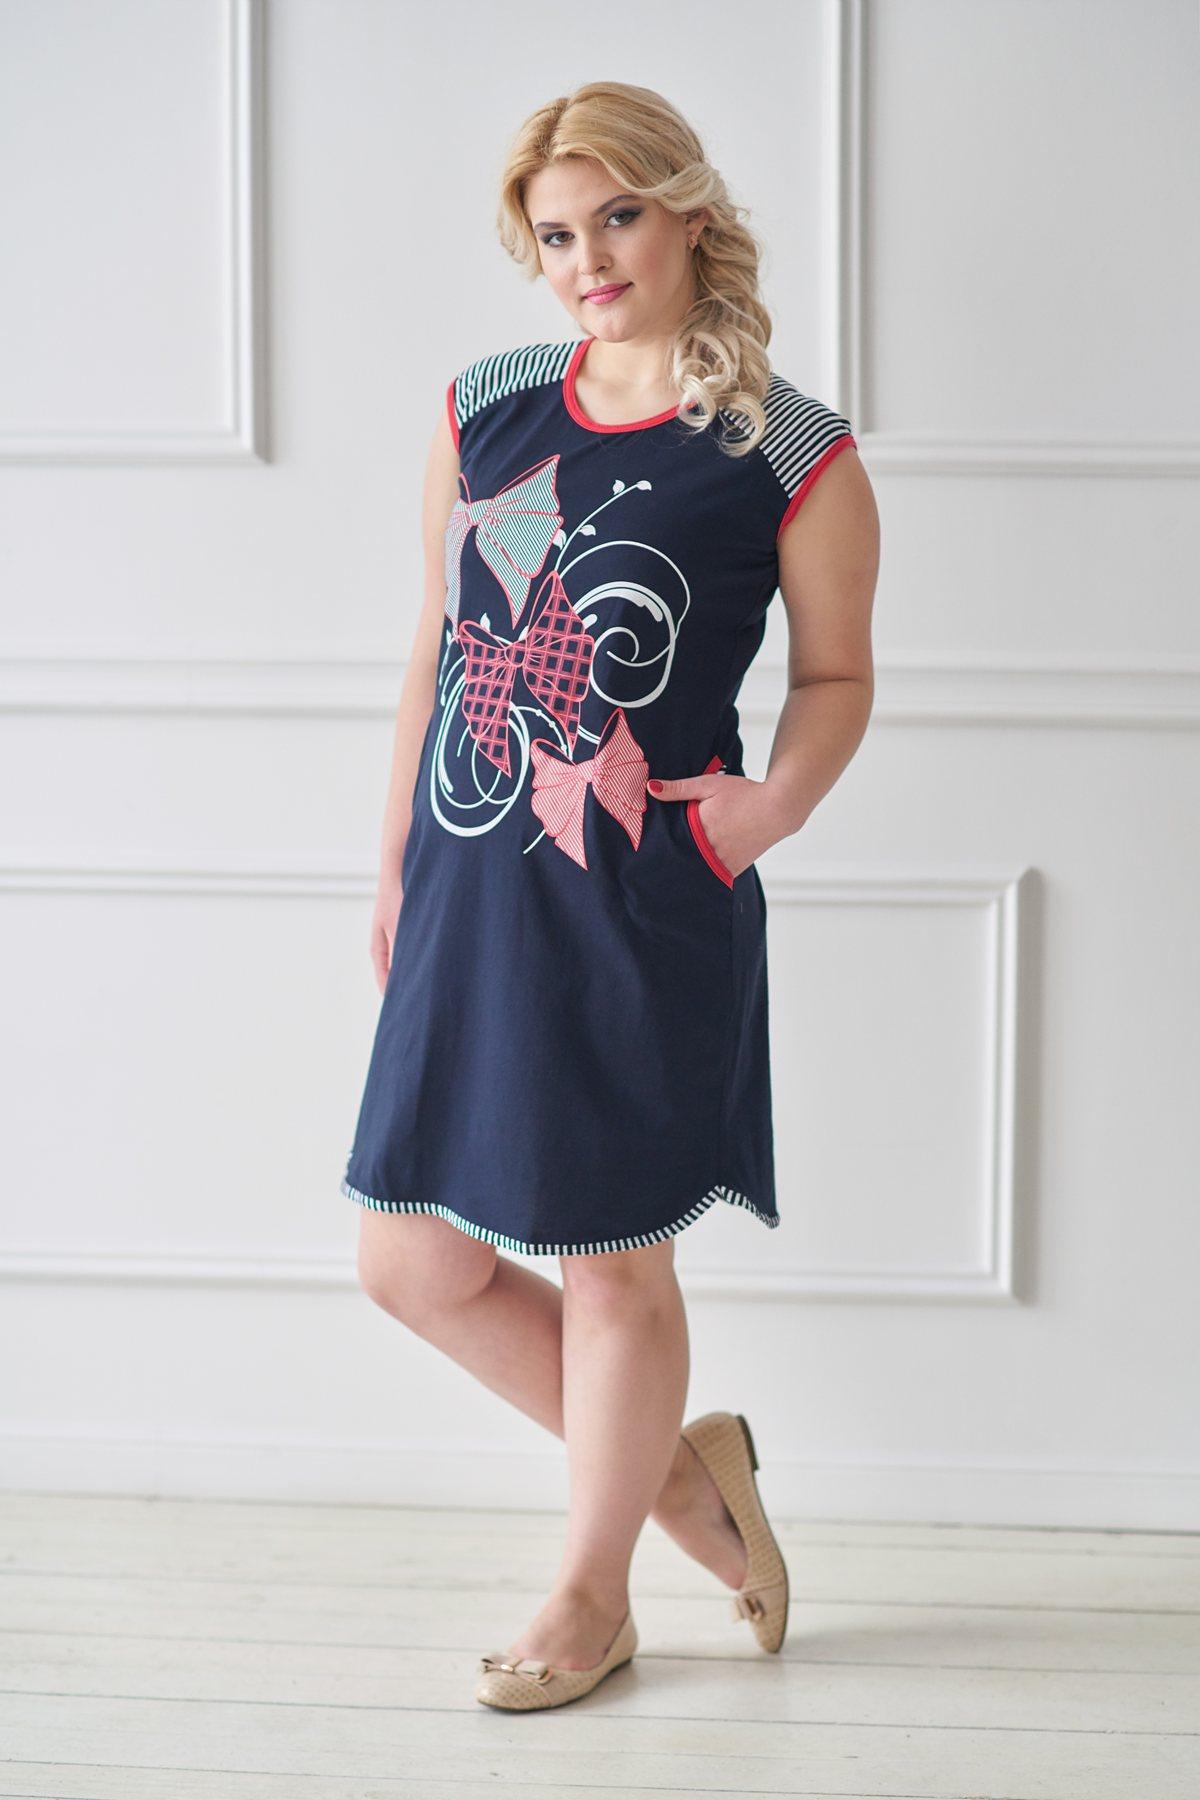 Жен. туника арт. 19-0027 Темно-синий р. 56 - Женская одежда артикул: 28831